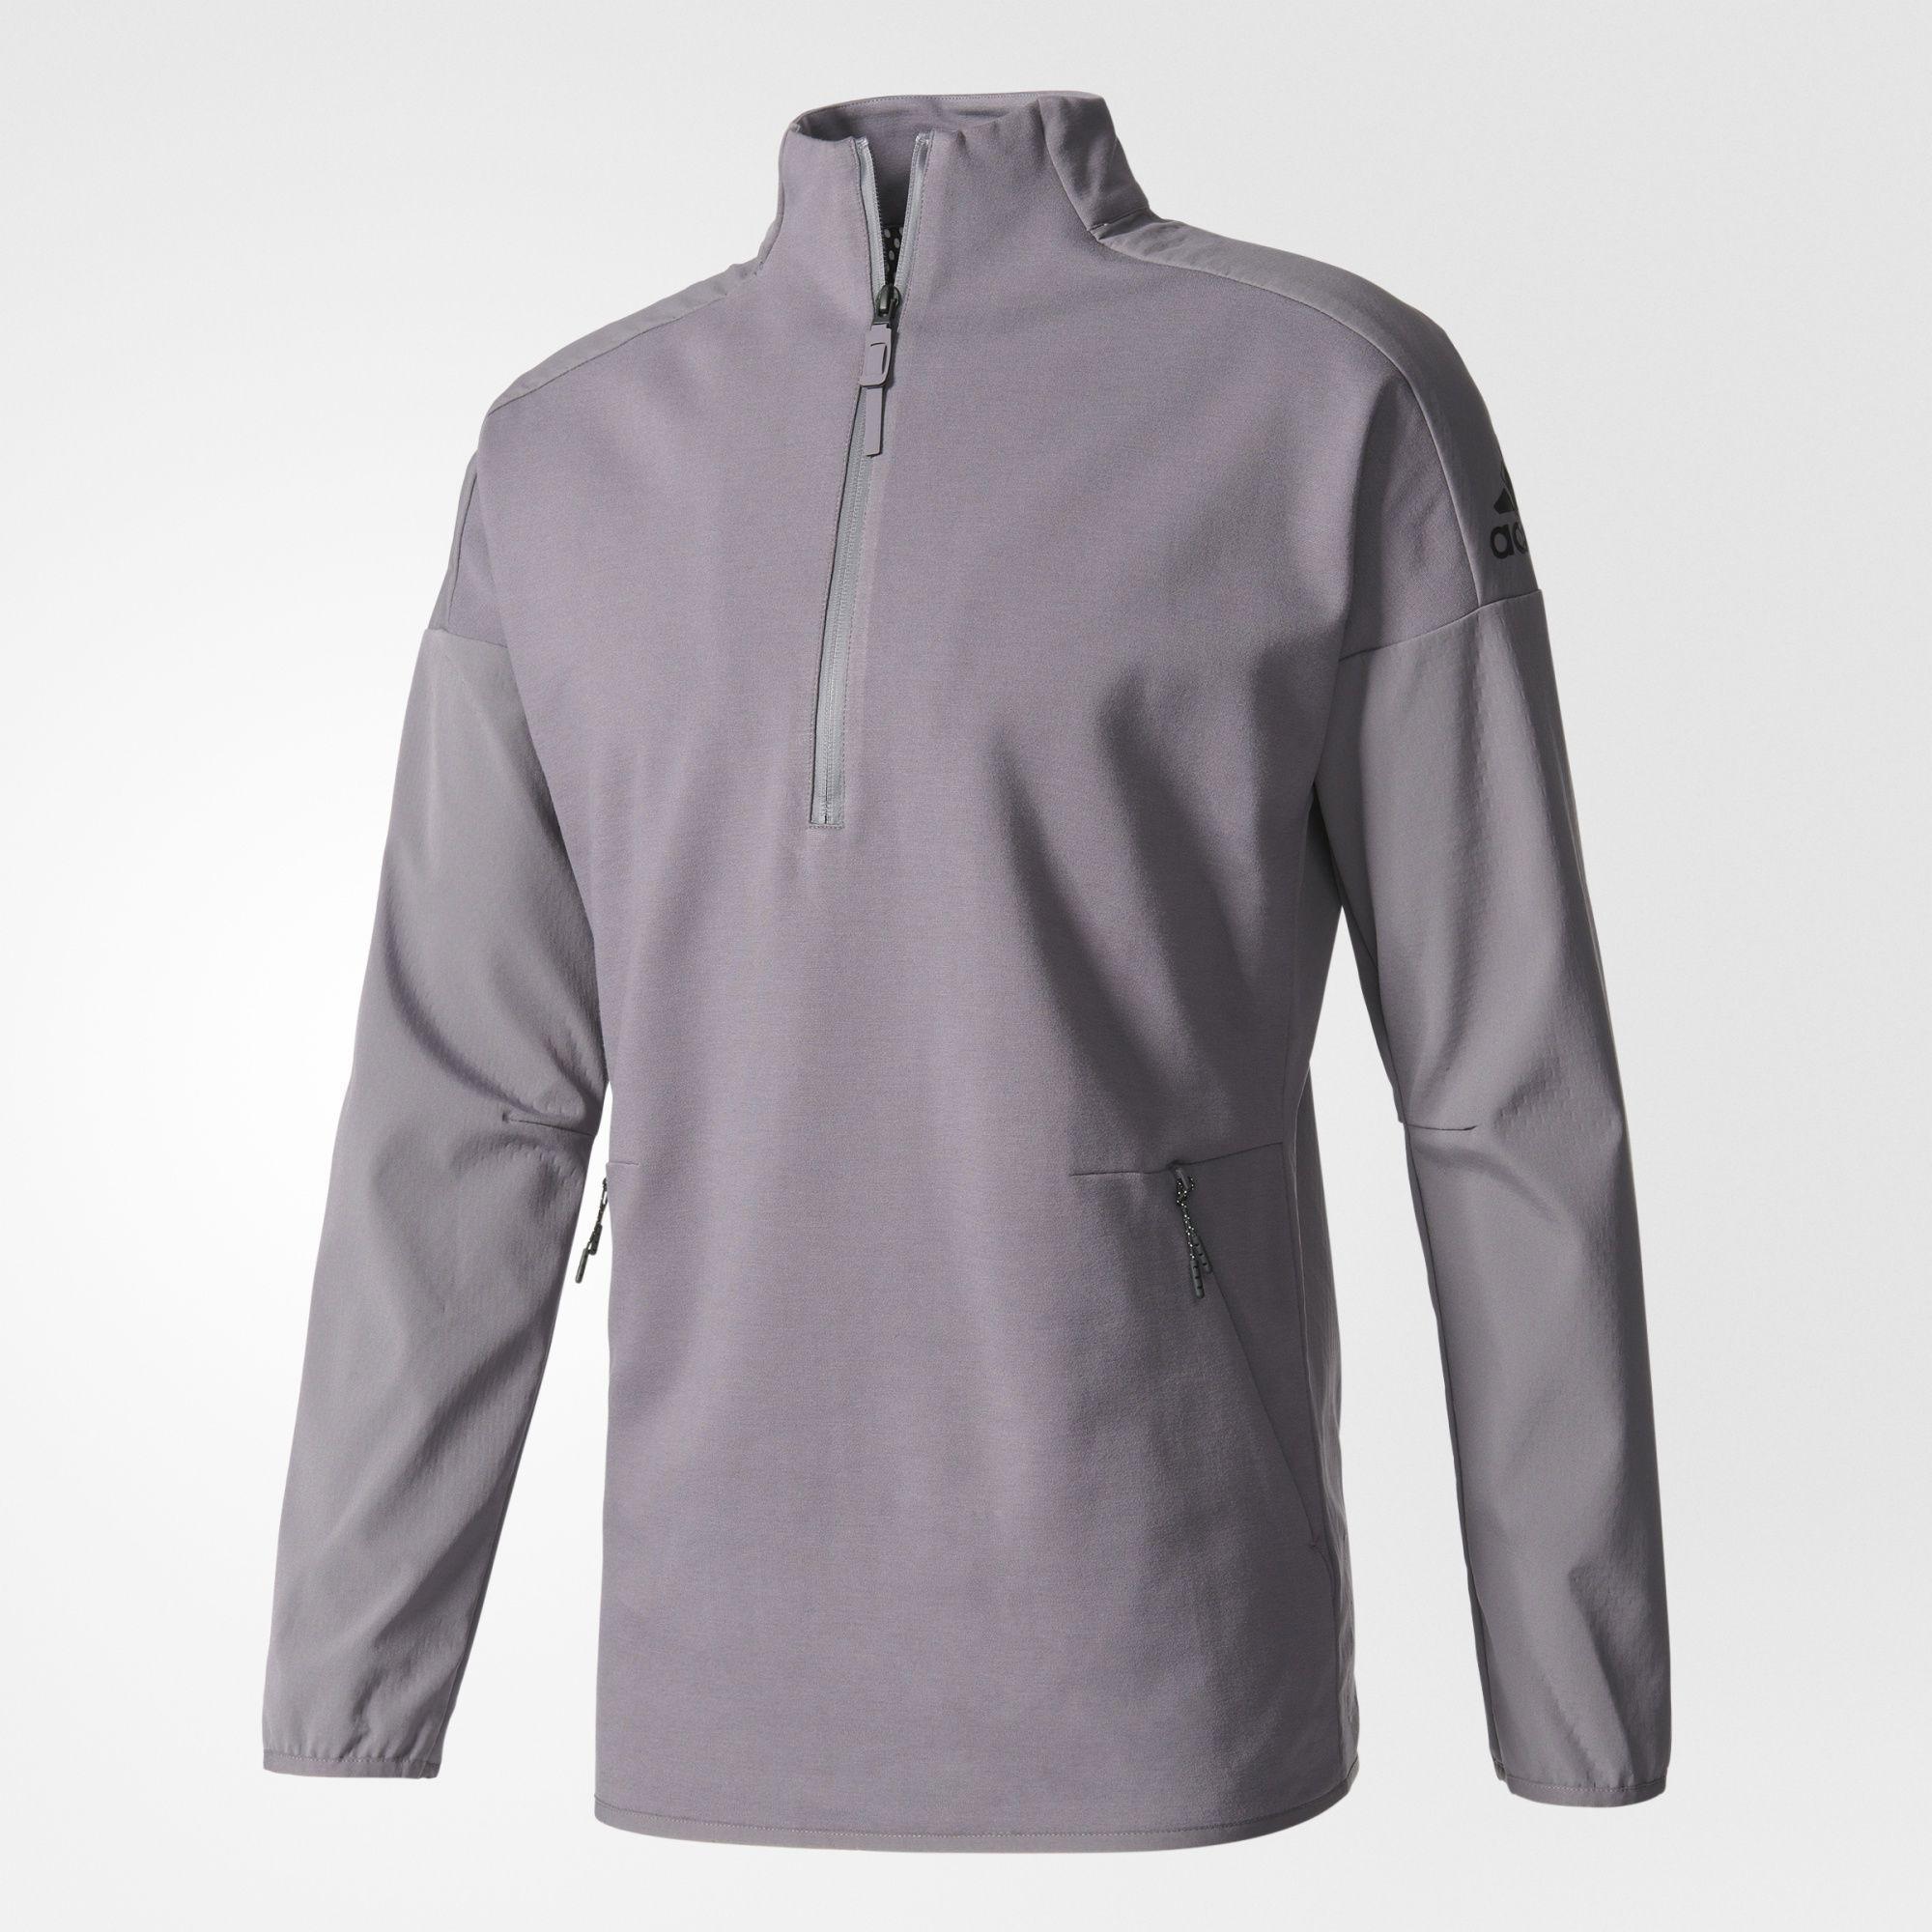 Adidas jaket Z N E tracking Jacket S clearance abu